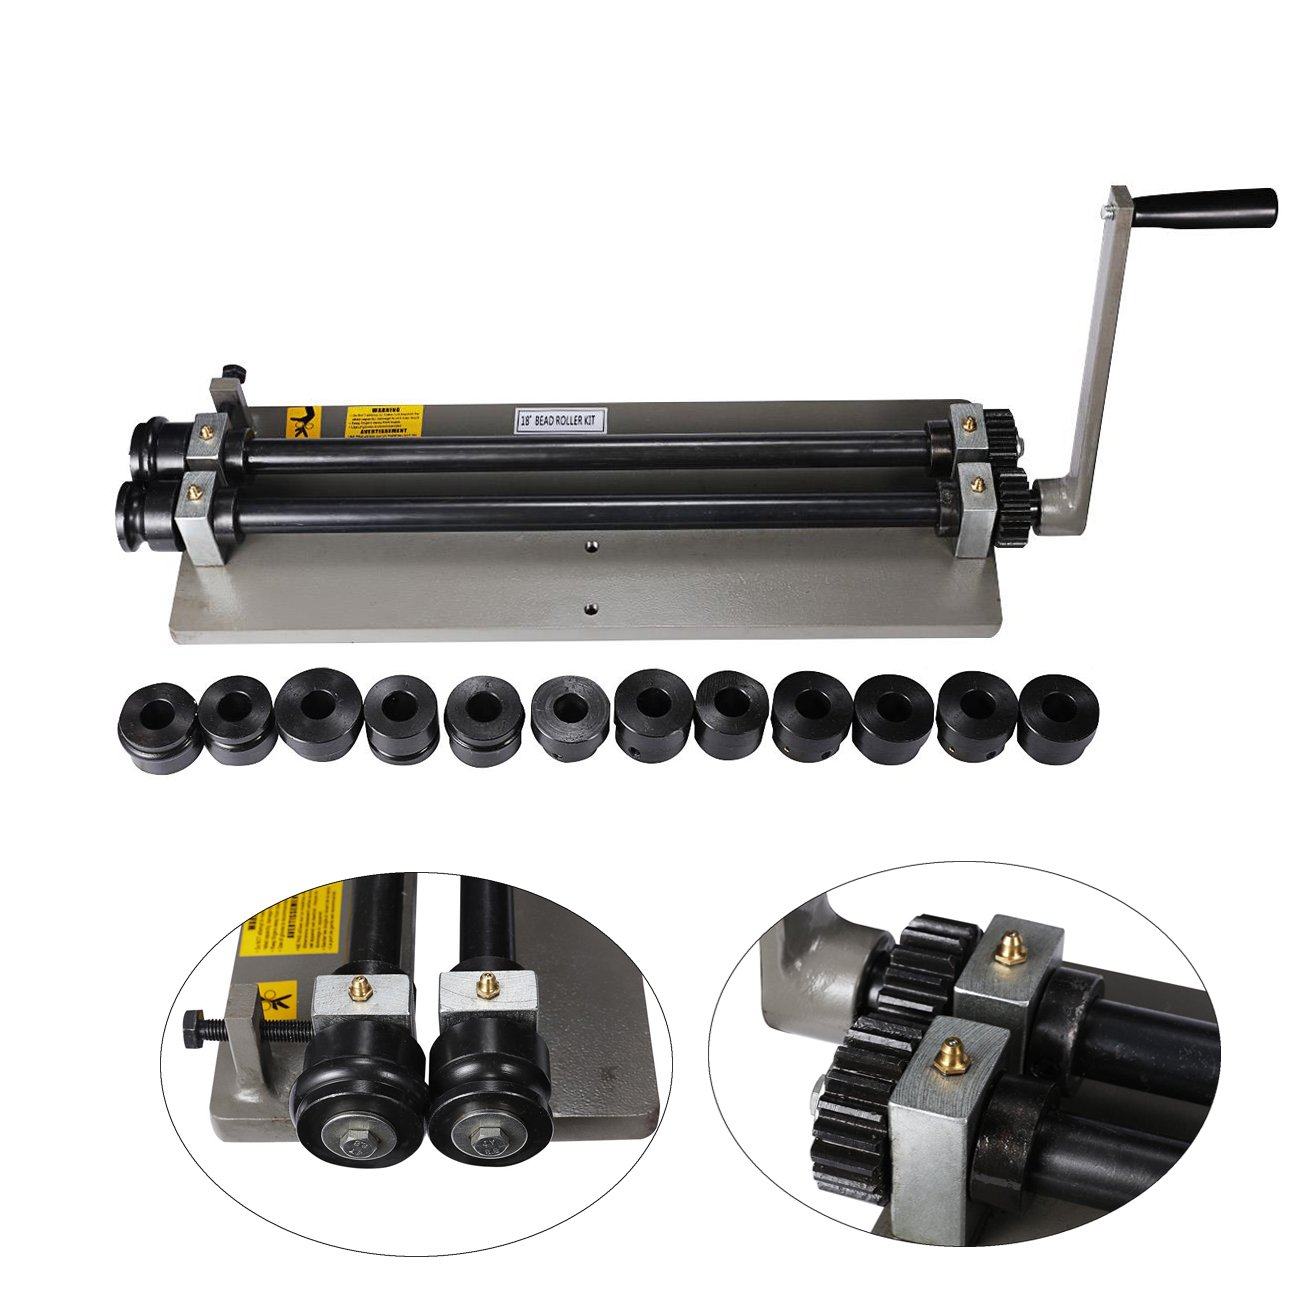 BEAMNOVA Sheet Metal Bead Roller Machine 18 inch Gear Drive Bench 6 Dies Set by BEAMNOVA